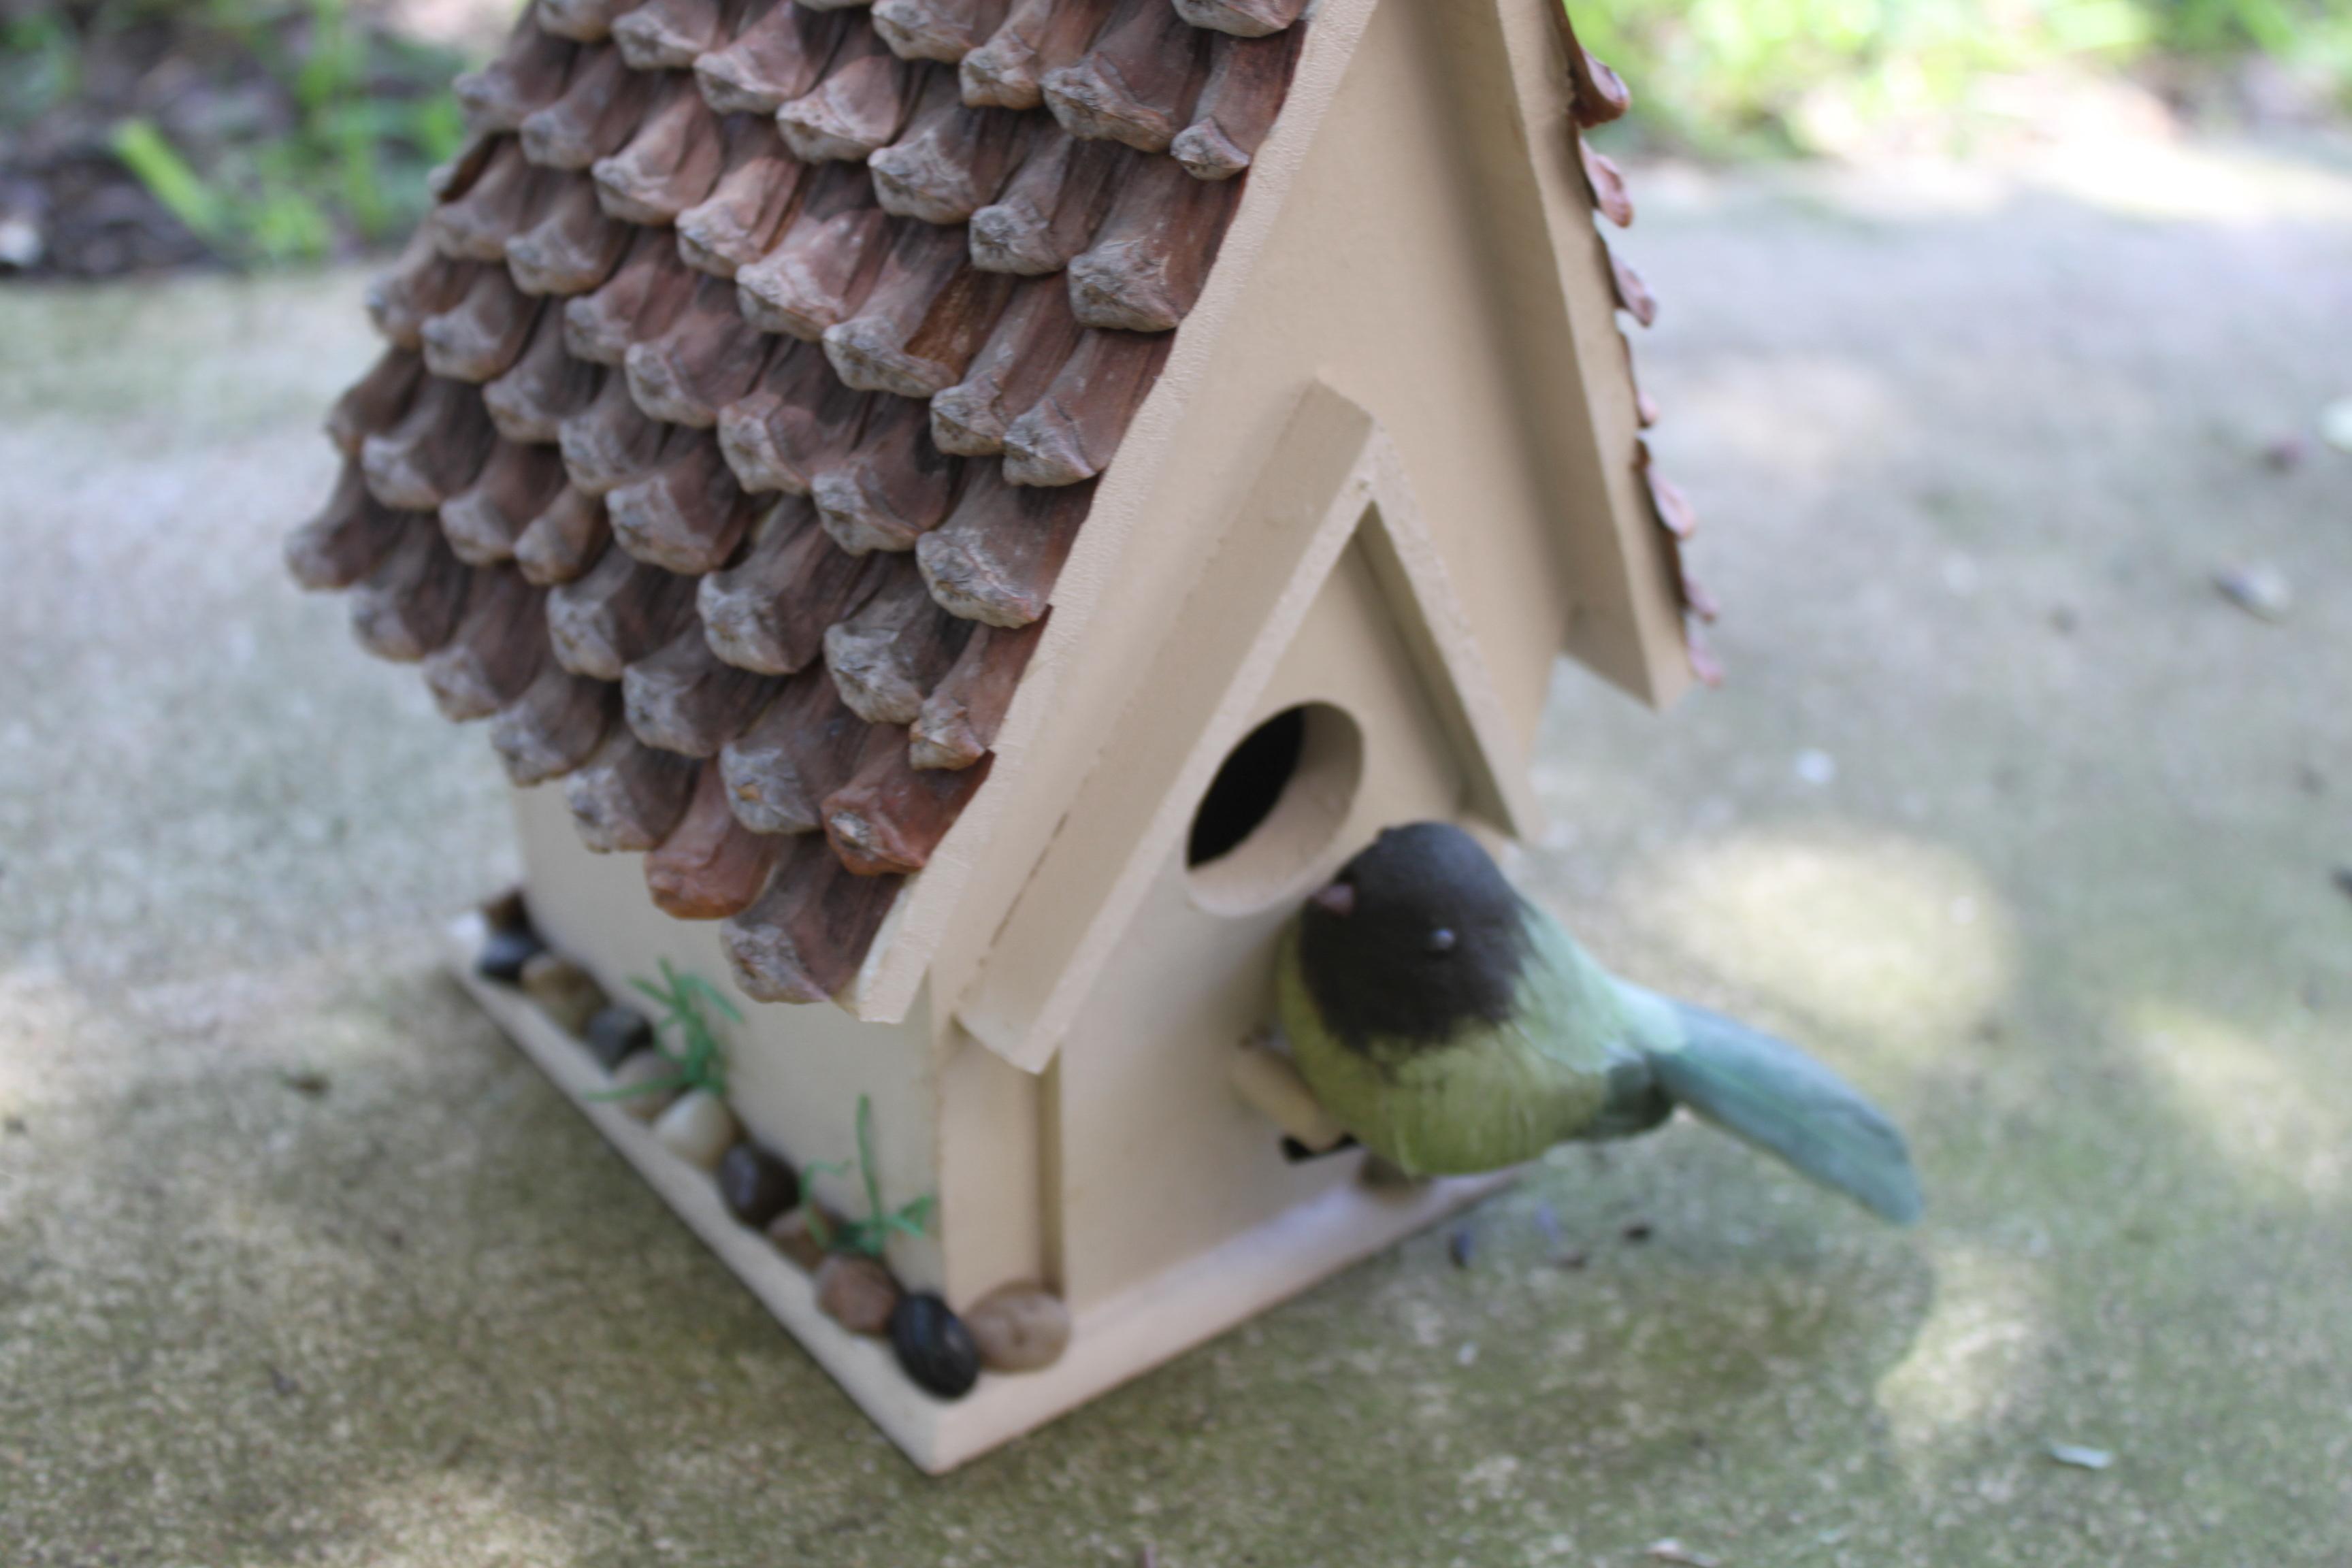 Diy birdhouse gift frugal fun for boys and girls for Diy bird house